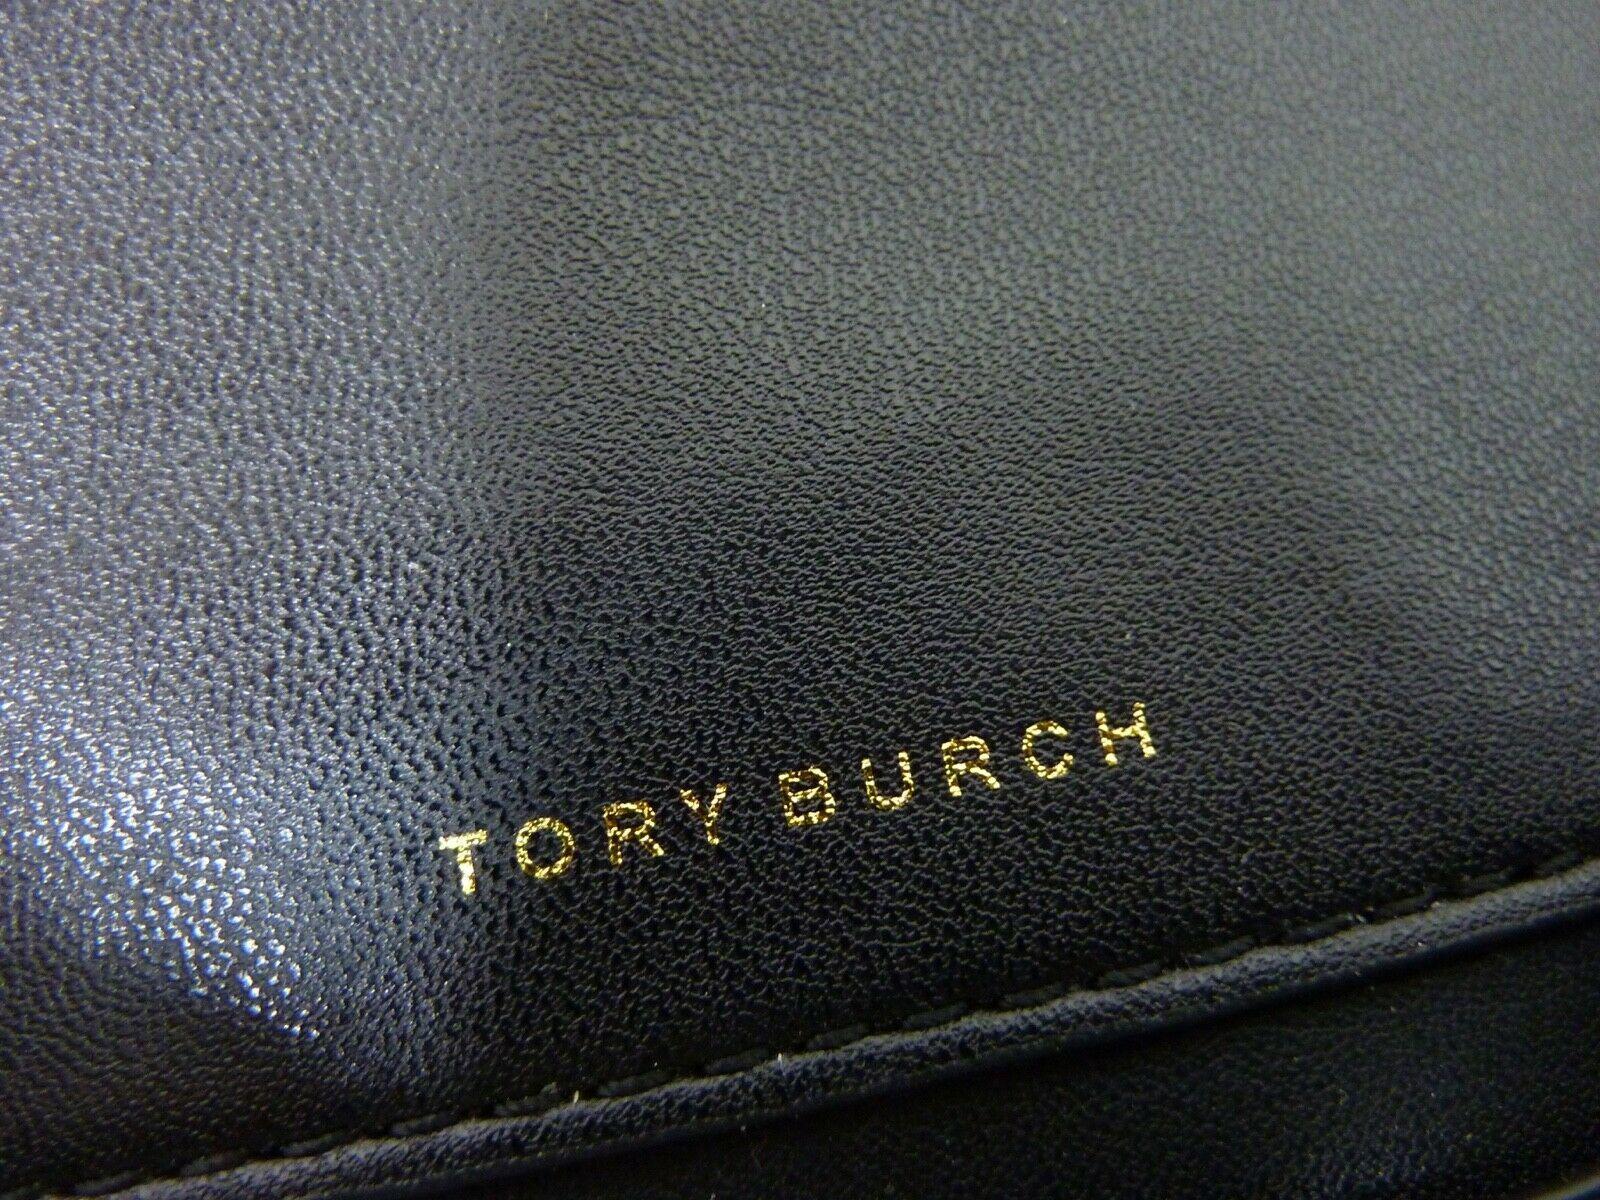 NWT Tory Burch Black Leather Miller Metal Cross-Body Bag/Mini Shoulder Bag $398 image 9